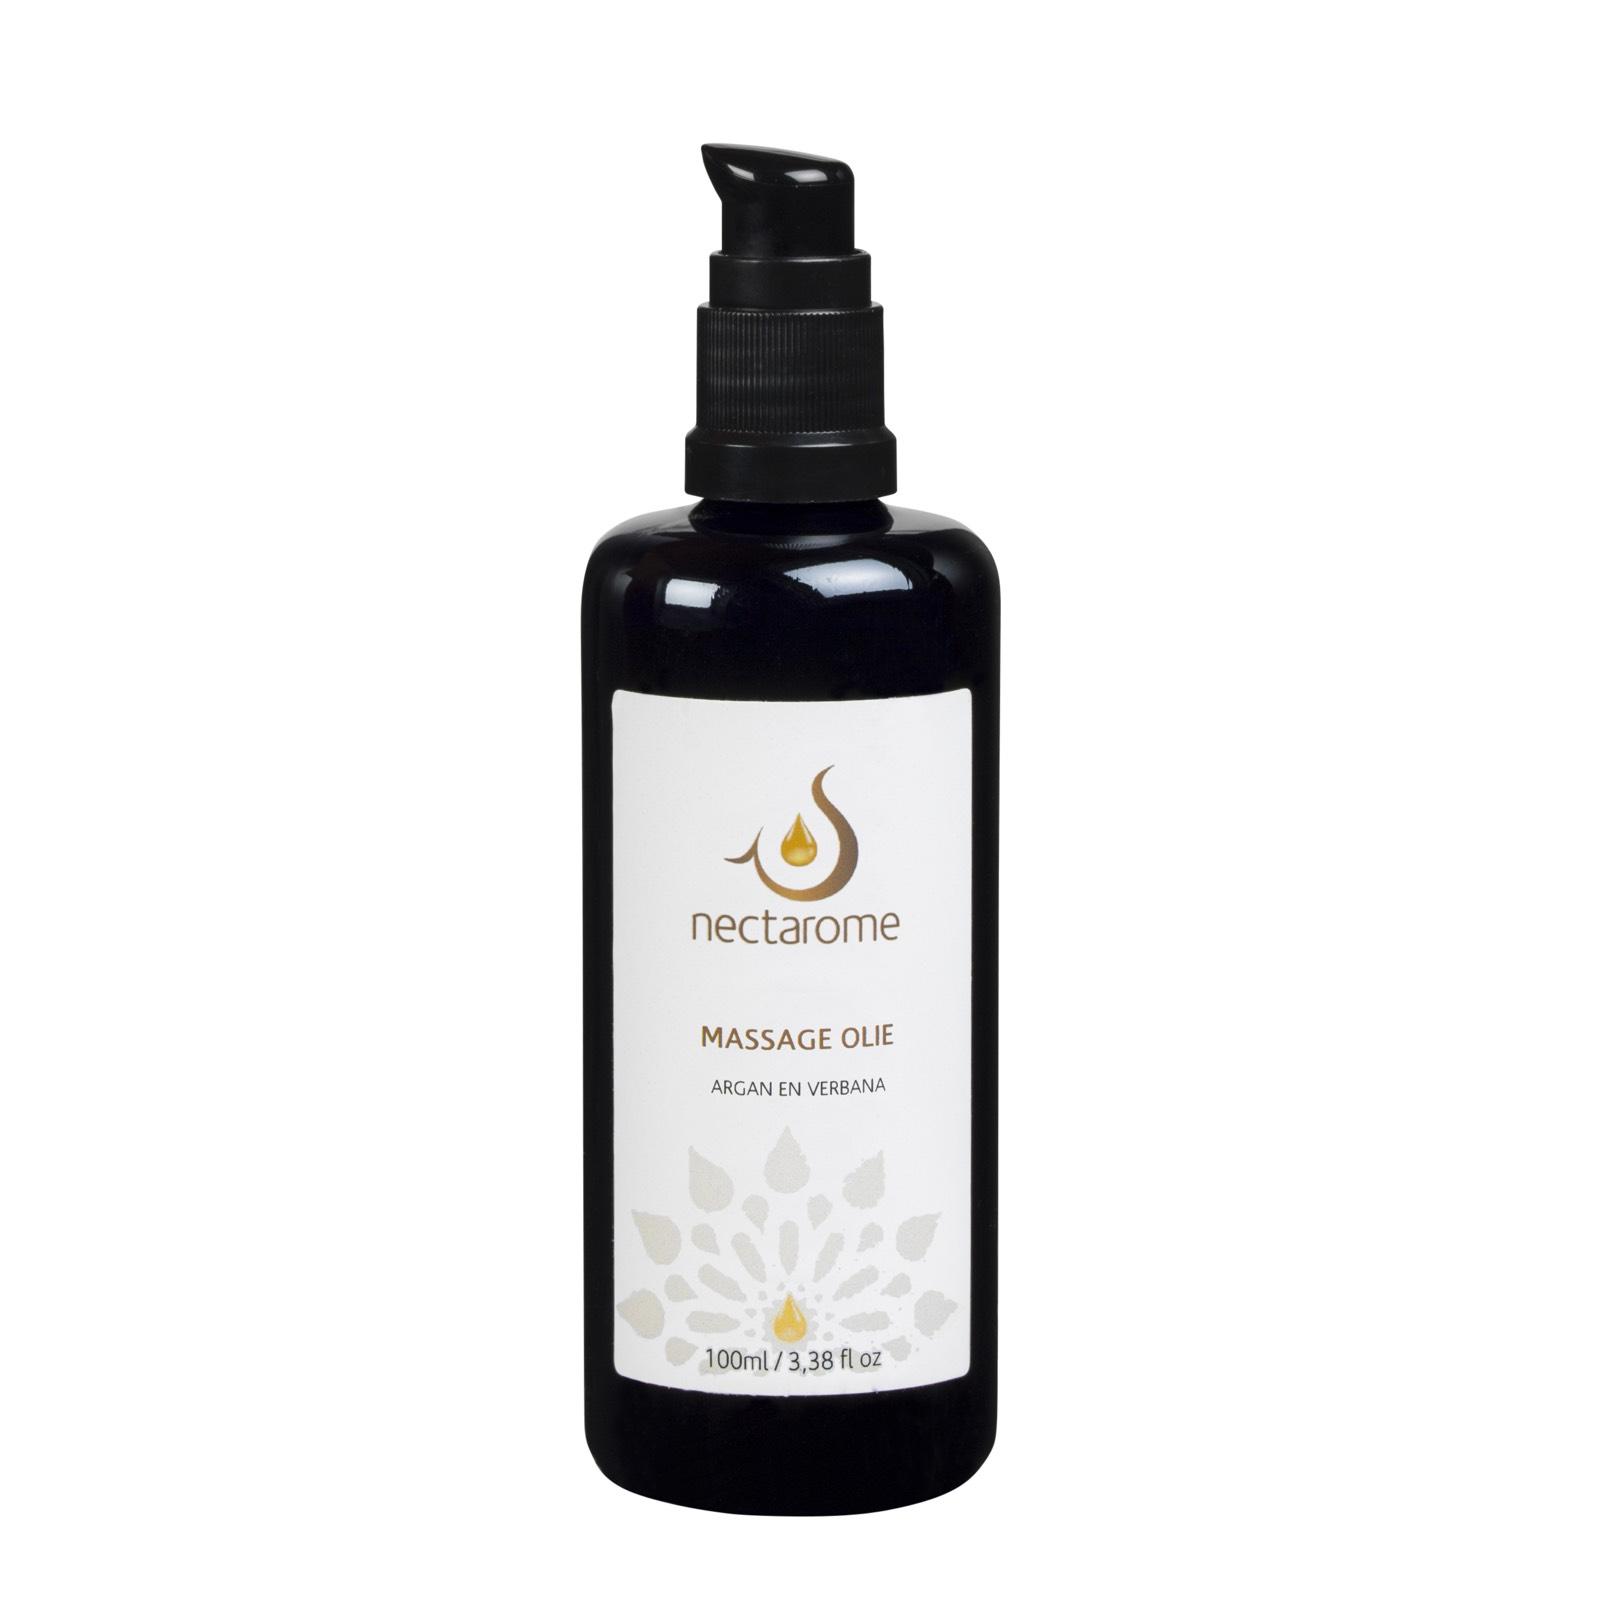 Nectarome massage olie